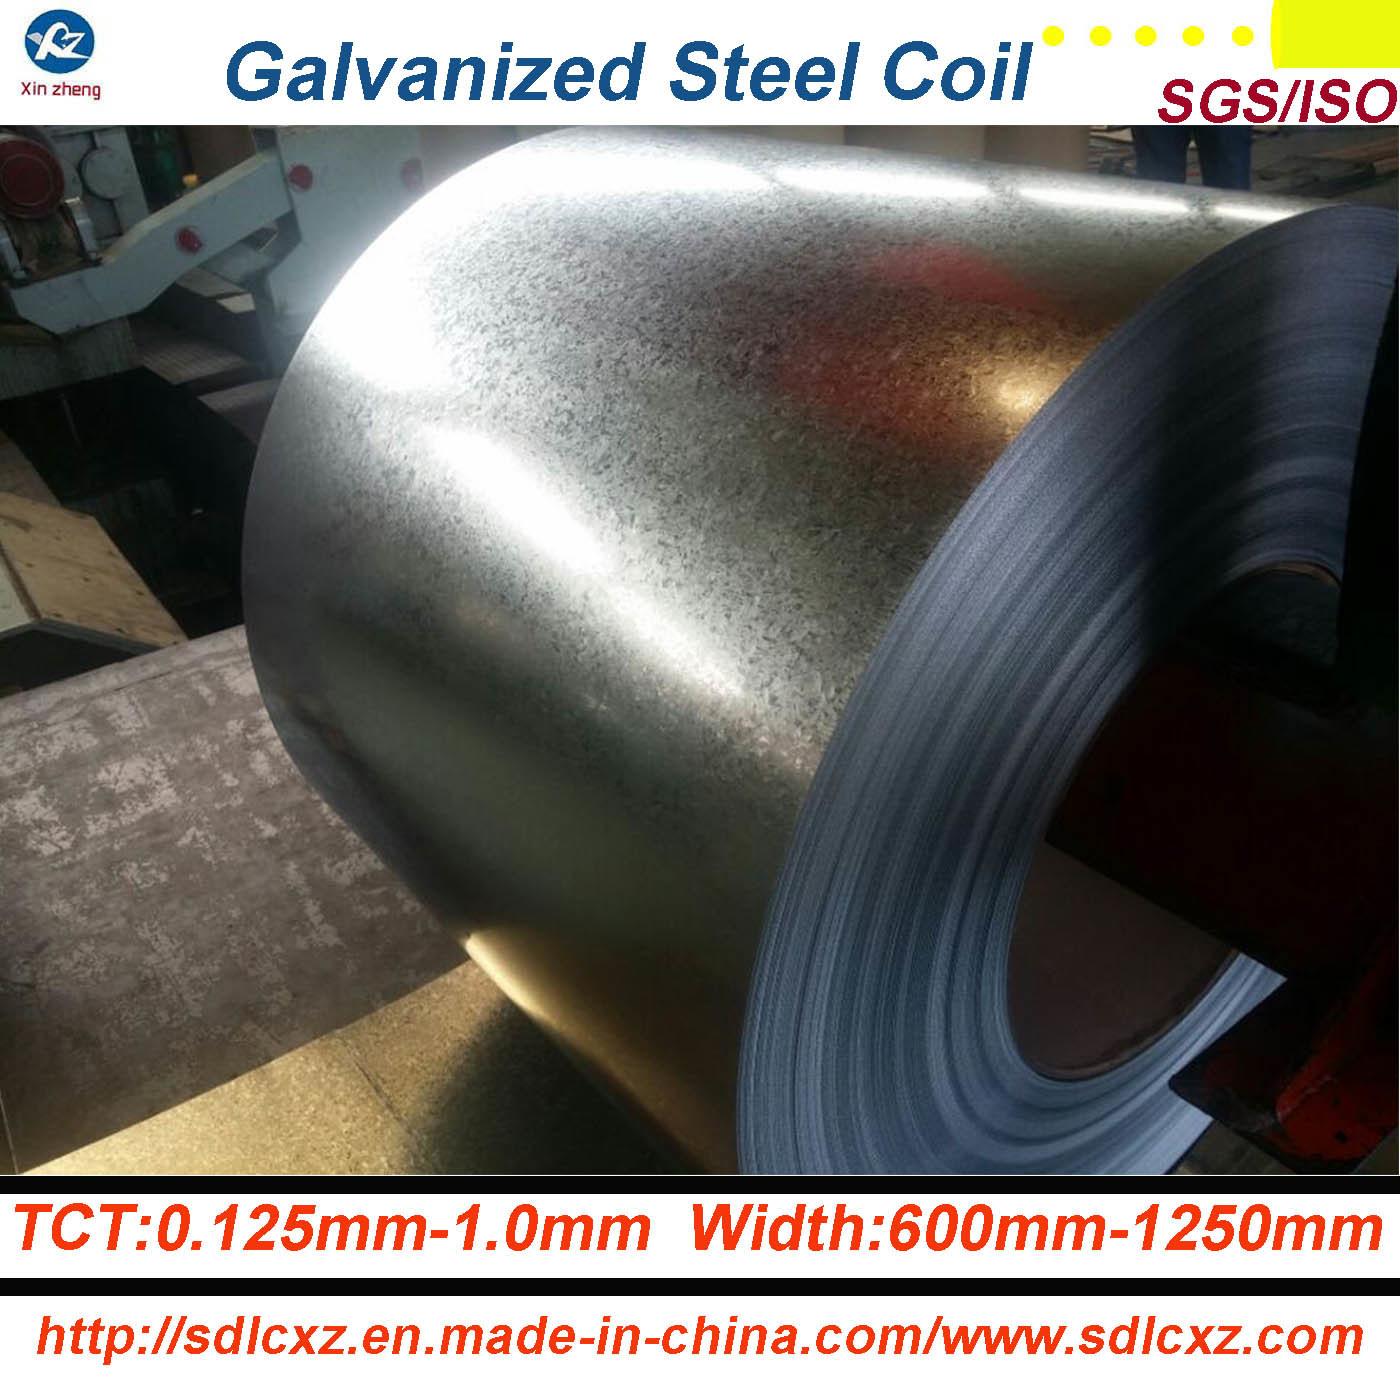 Gi-Galvanized Steel/ Z150g Galvanized Steel Coil/ PPGI Galvanized Steel Sheet